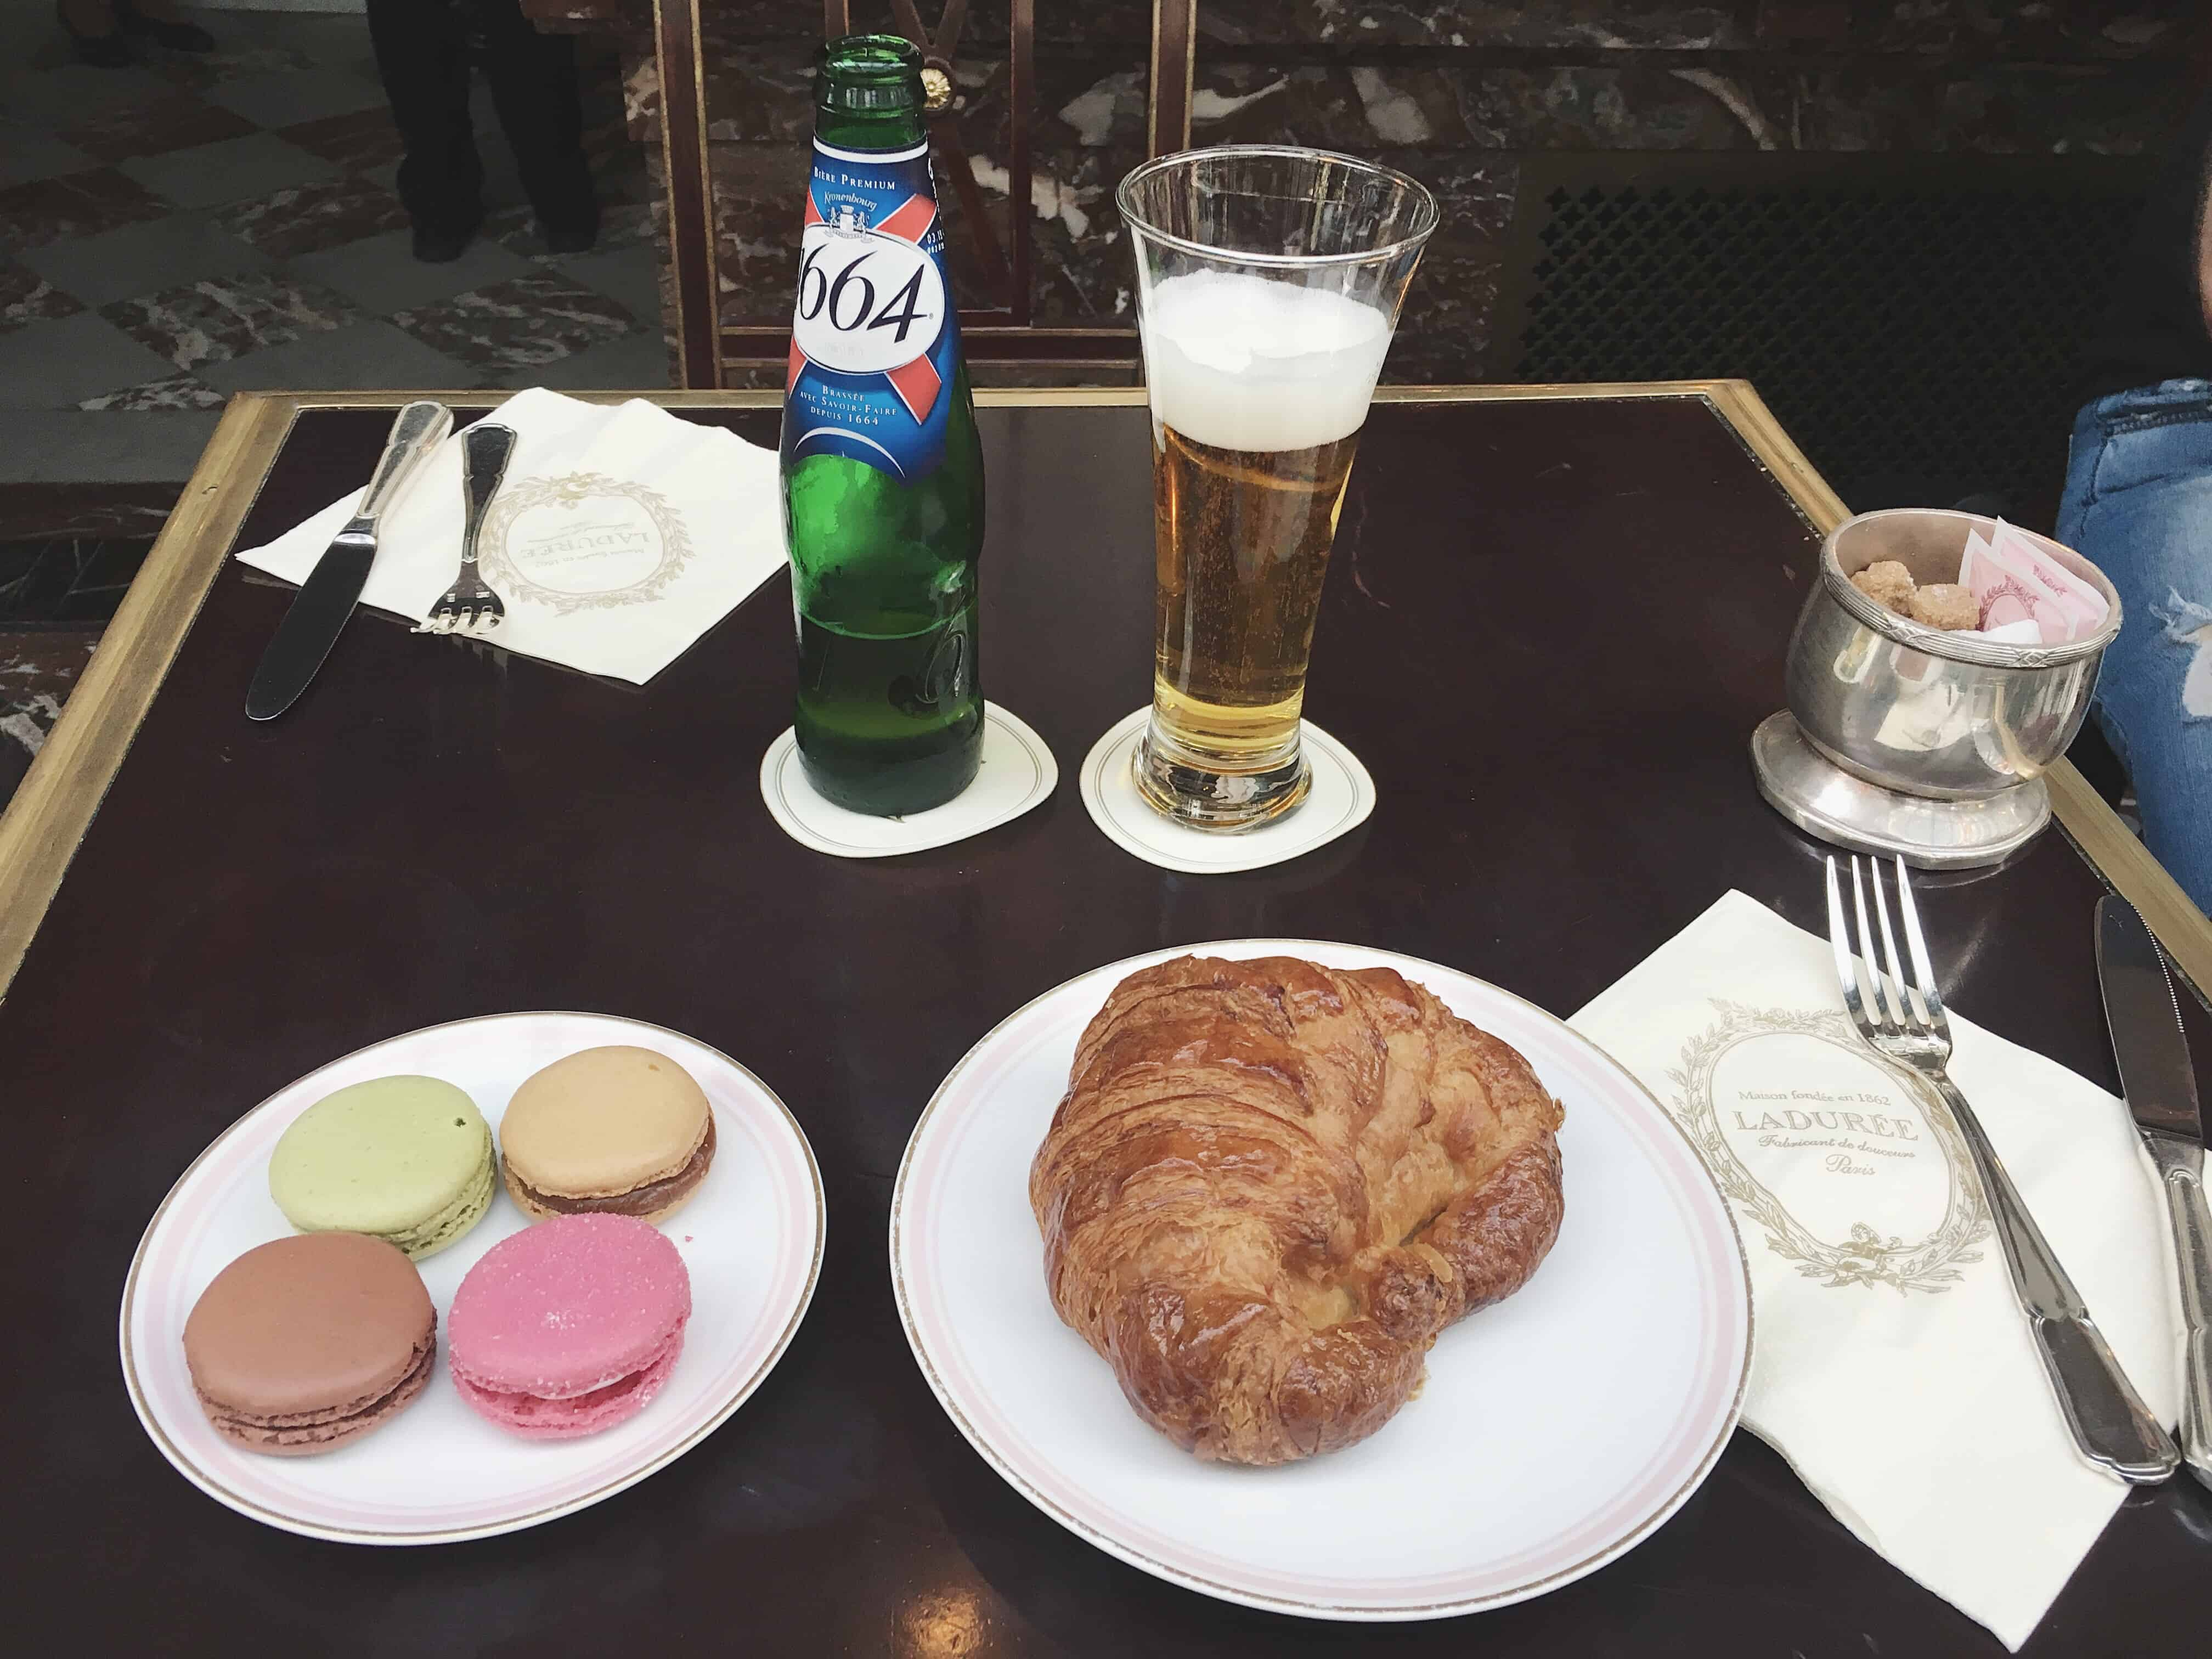 Croissant and macarons at Laudurée in Paris, France